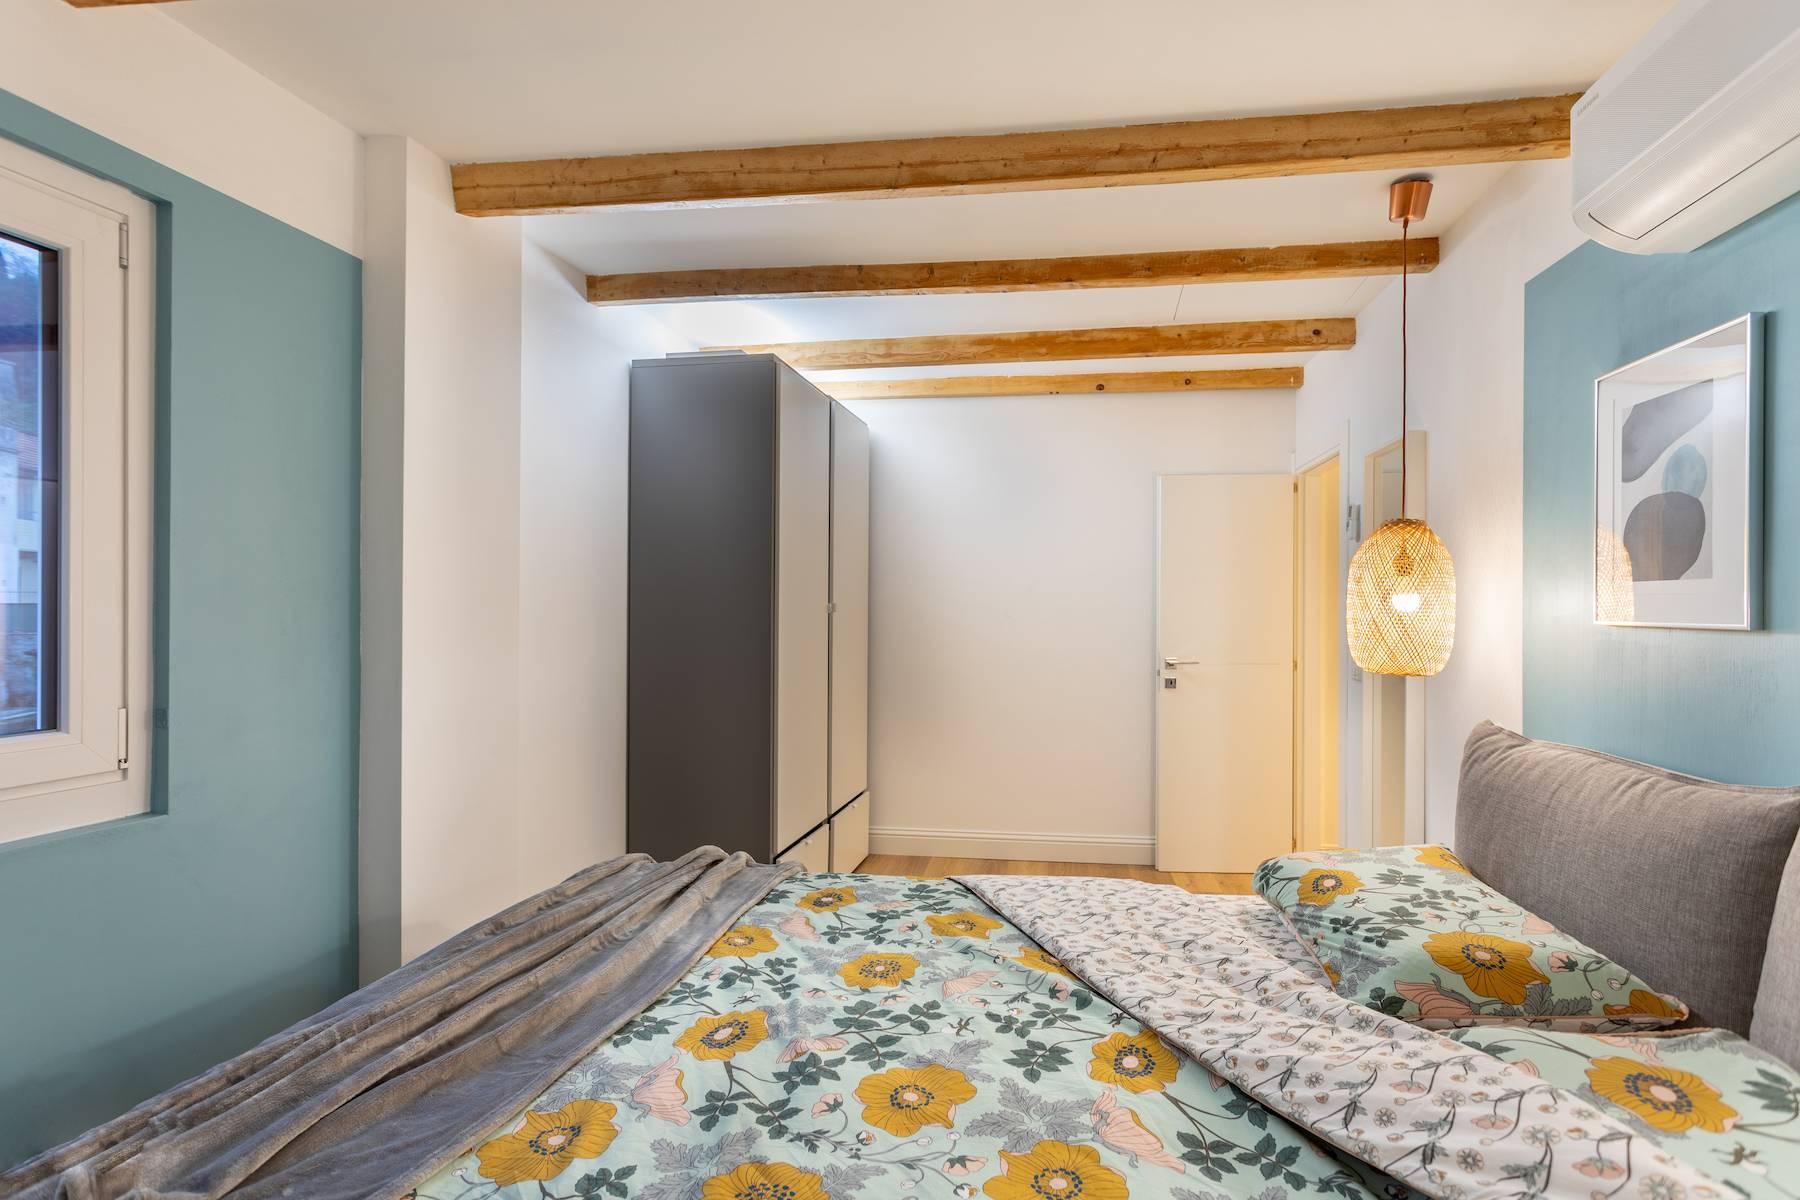 Appartamento in Vendita a Belgirate: 3 locali, 62 mq - Foto 19